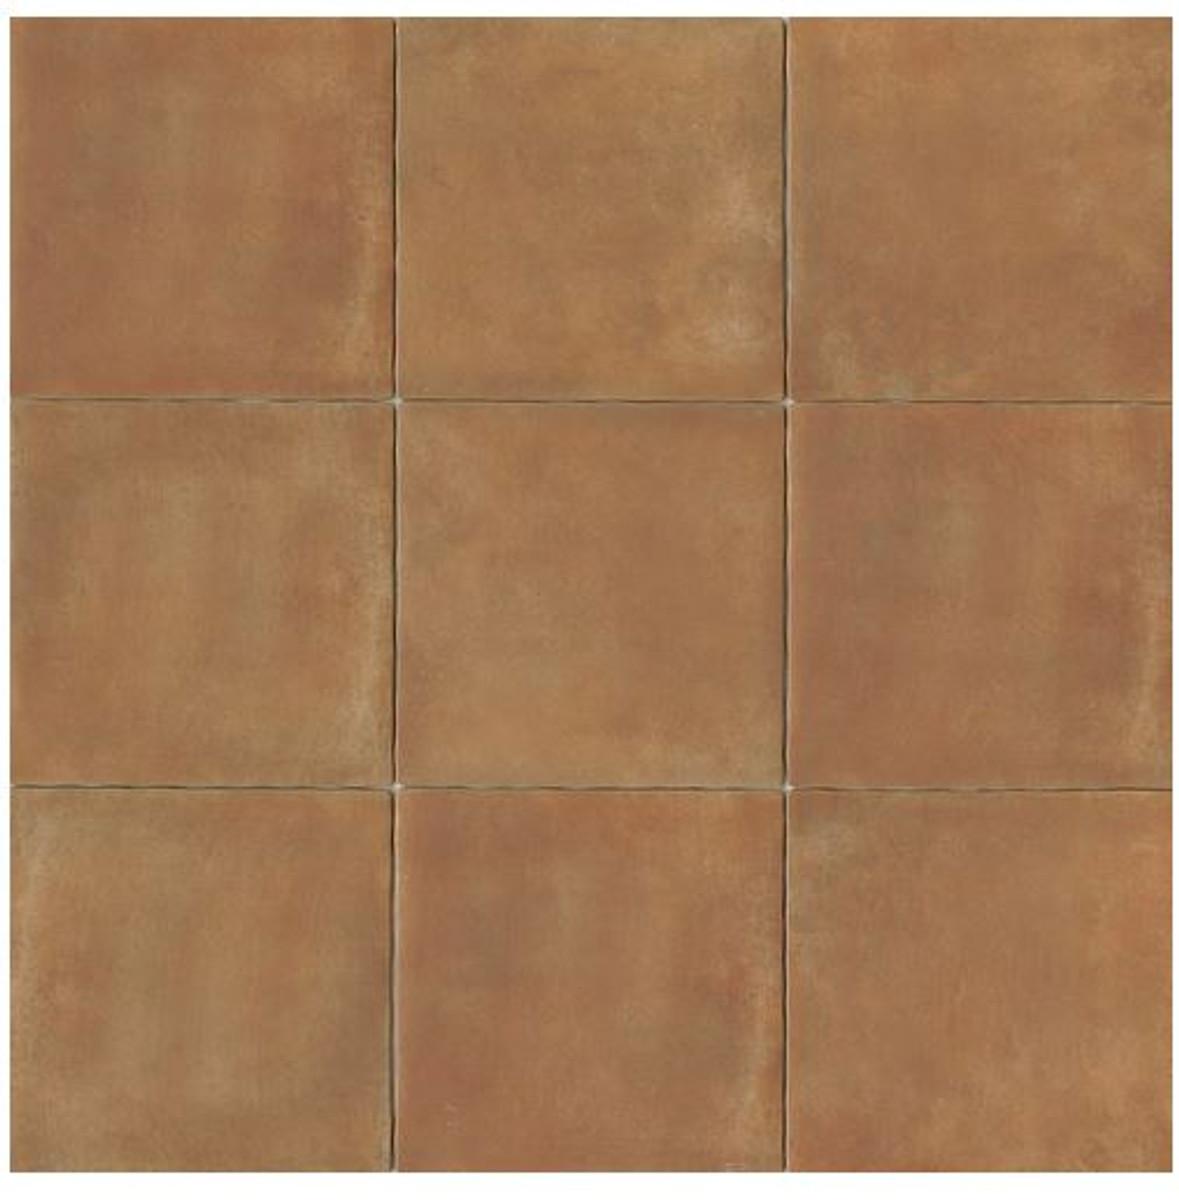 Terra Cotta Porcelain Tile 14x14 Matte Finish Cotto Field Tile Siena ( Caramel )